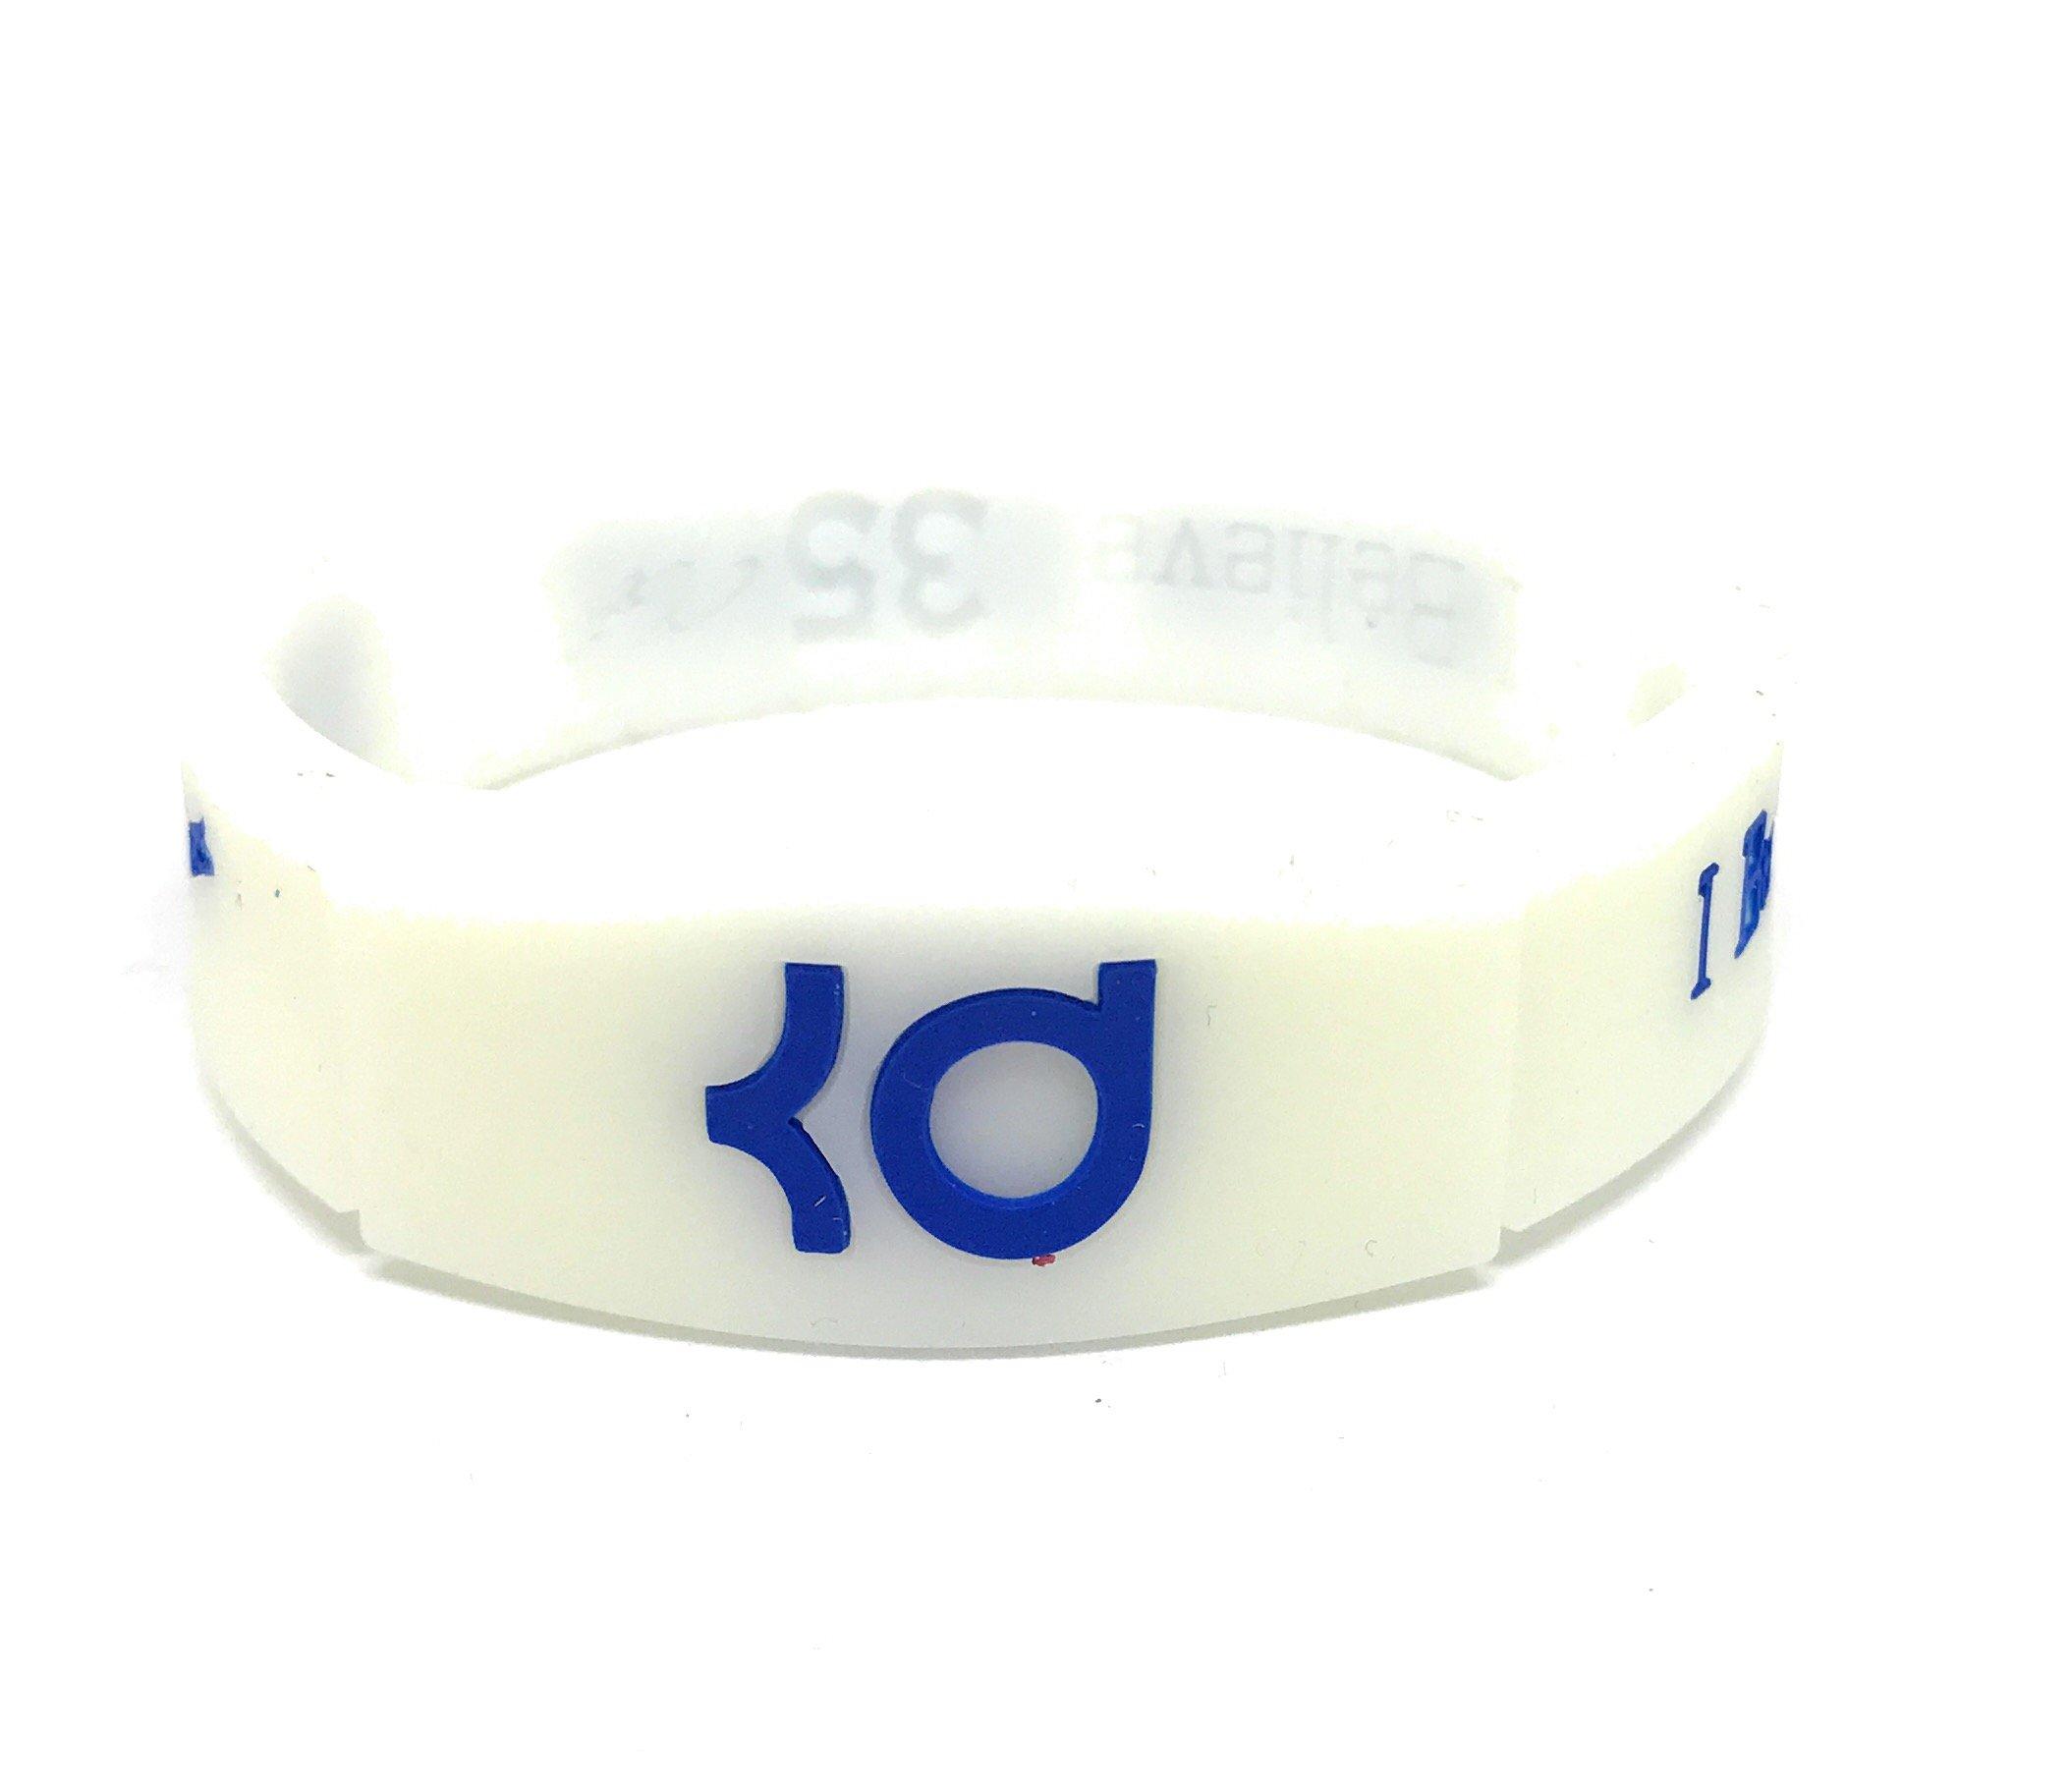 KIDS SportsBraceletsPro REVERSIBLE KIDS Wristband KIDS SIZE 6.7'' Size Bracelets EXCELLENT GIFT IDEA (Durant KID 6.7'' White)